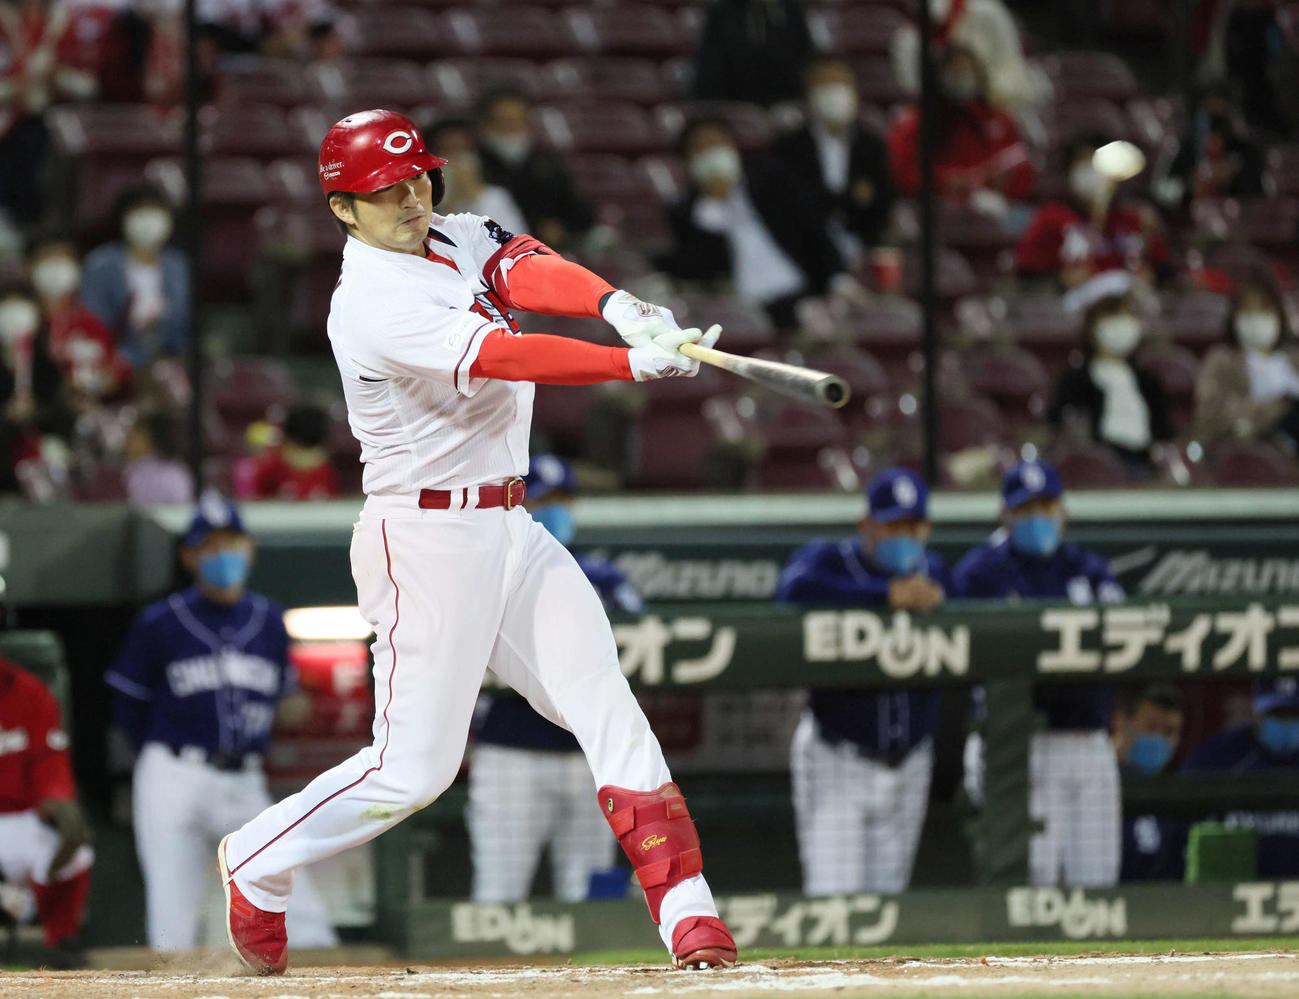 広島対中日 9回裏広島無死一、二塁、鈴木誠は3点本塁打を放つ(撮影・加藤孝規)